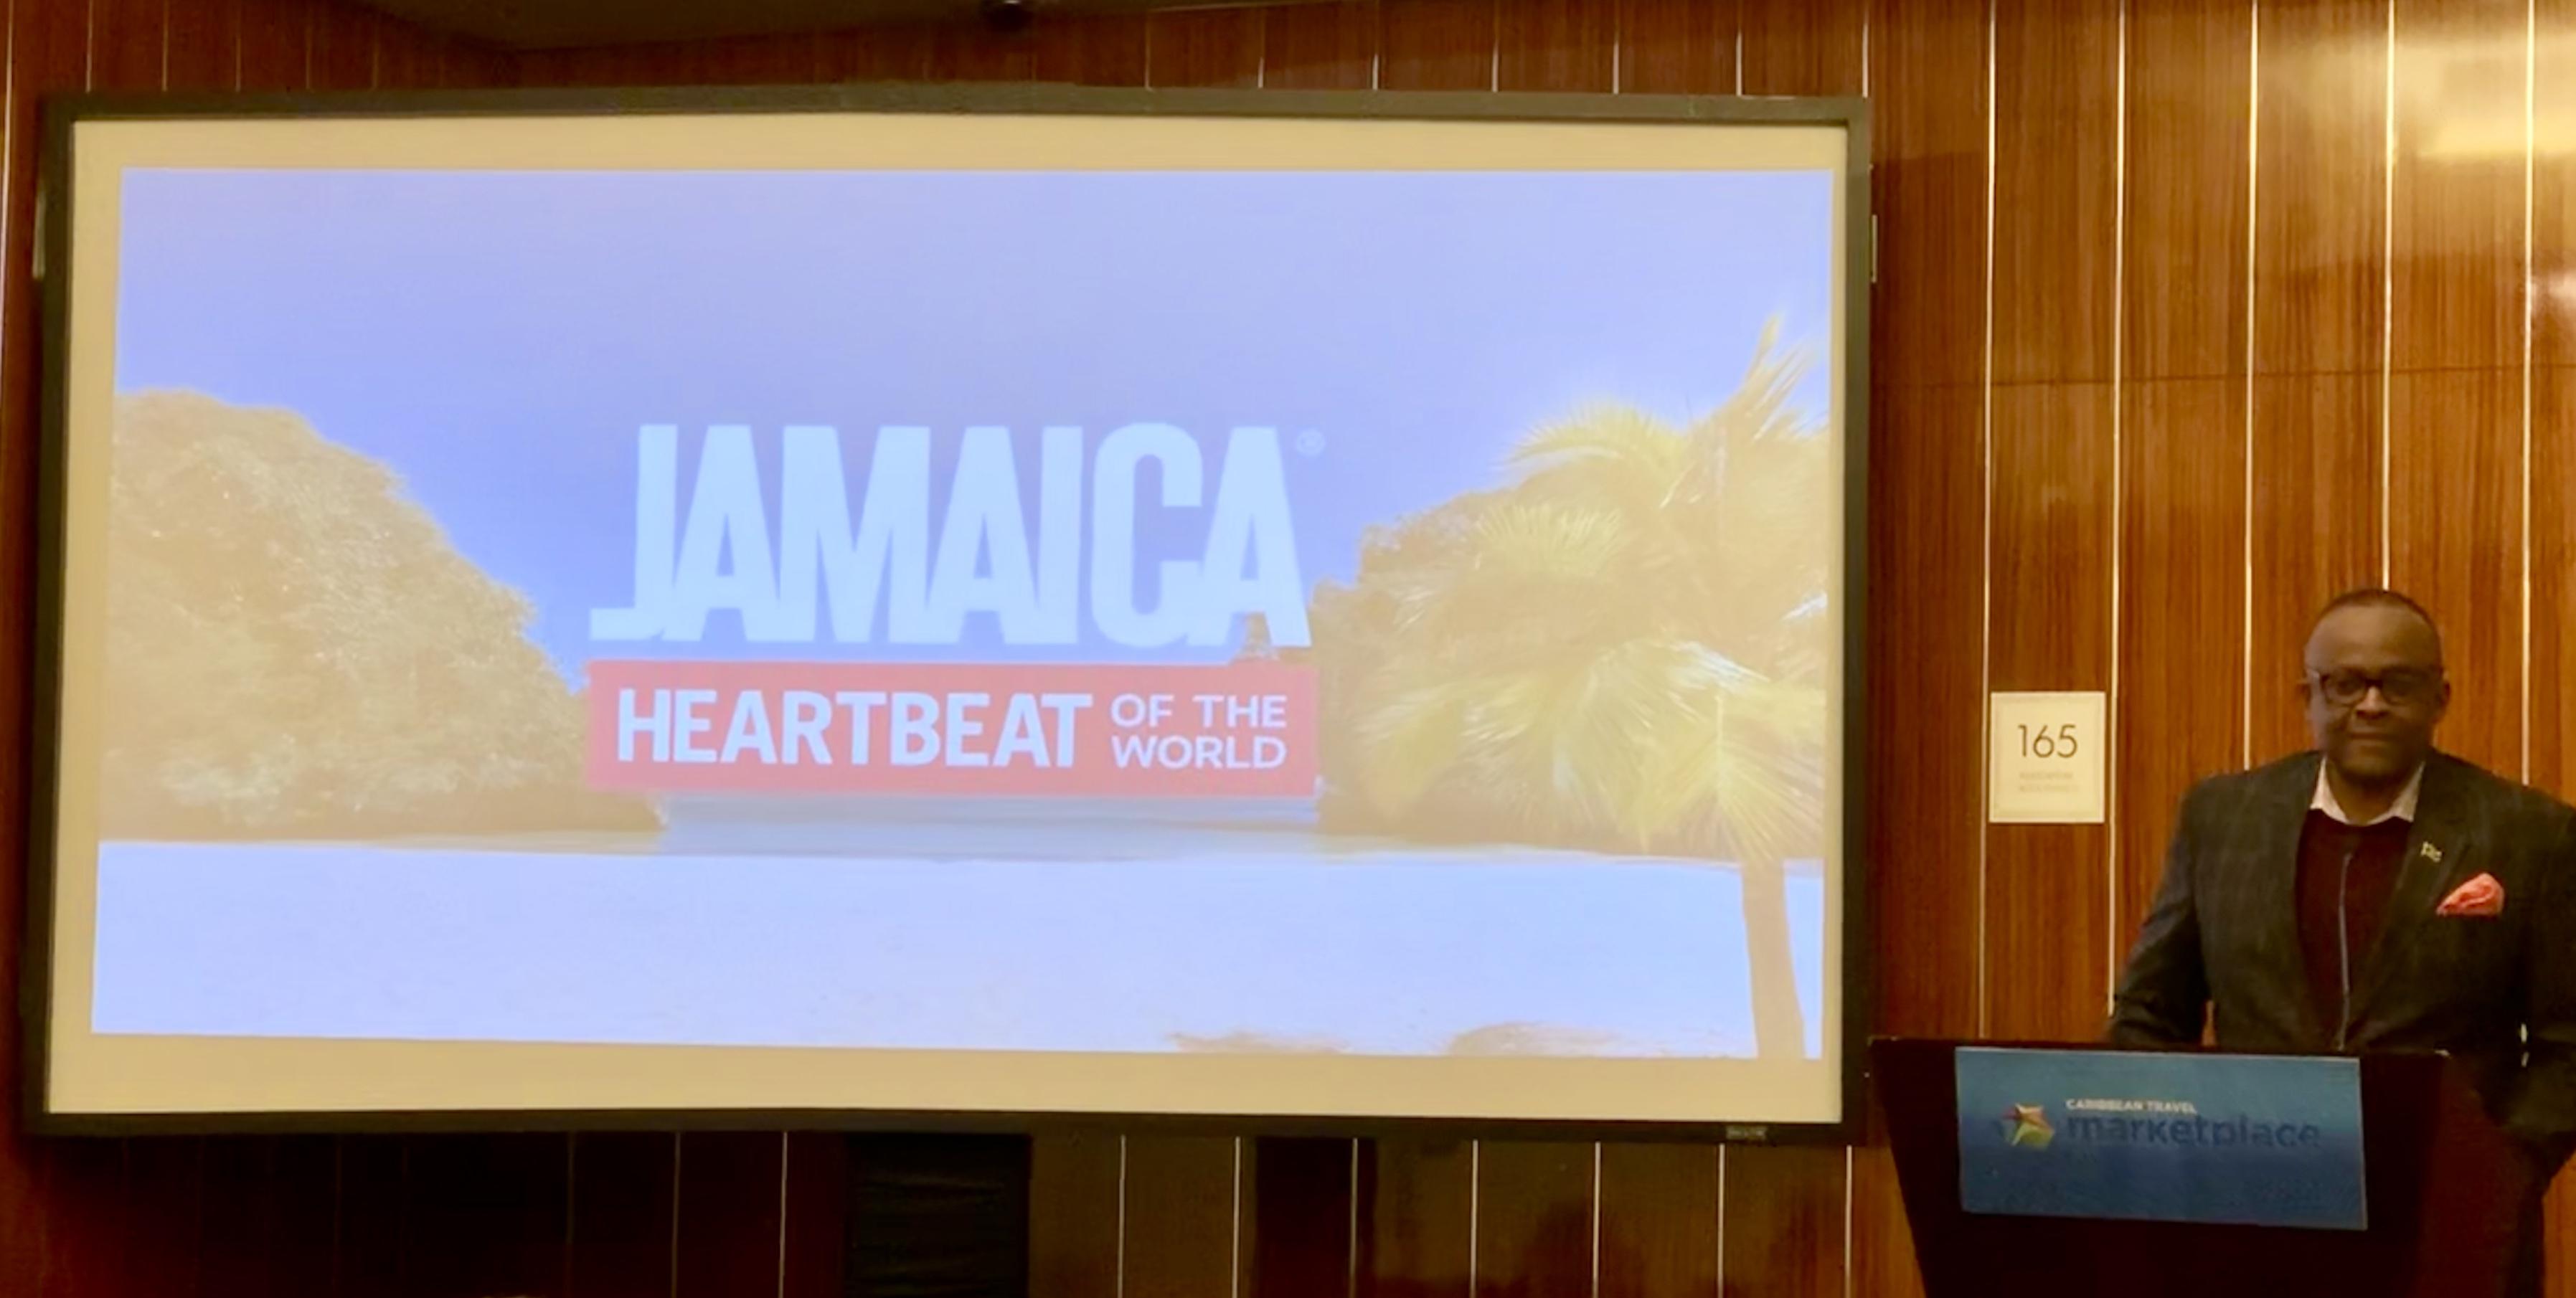 Director Donovan White - Heartbeat - Jamaica